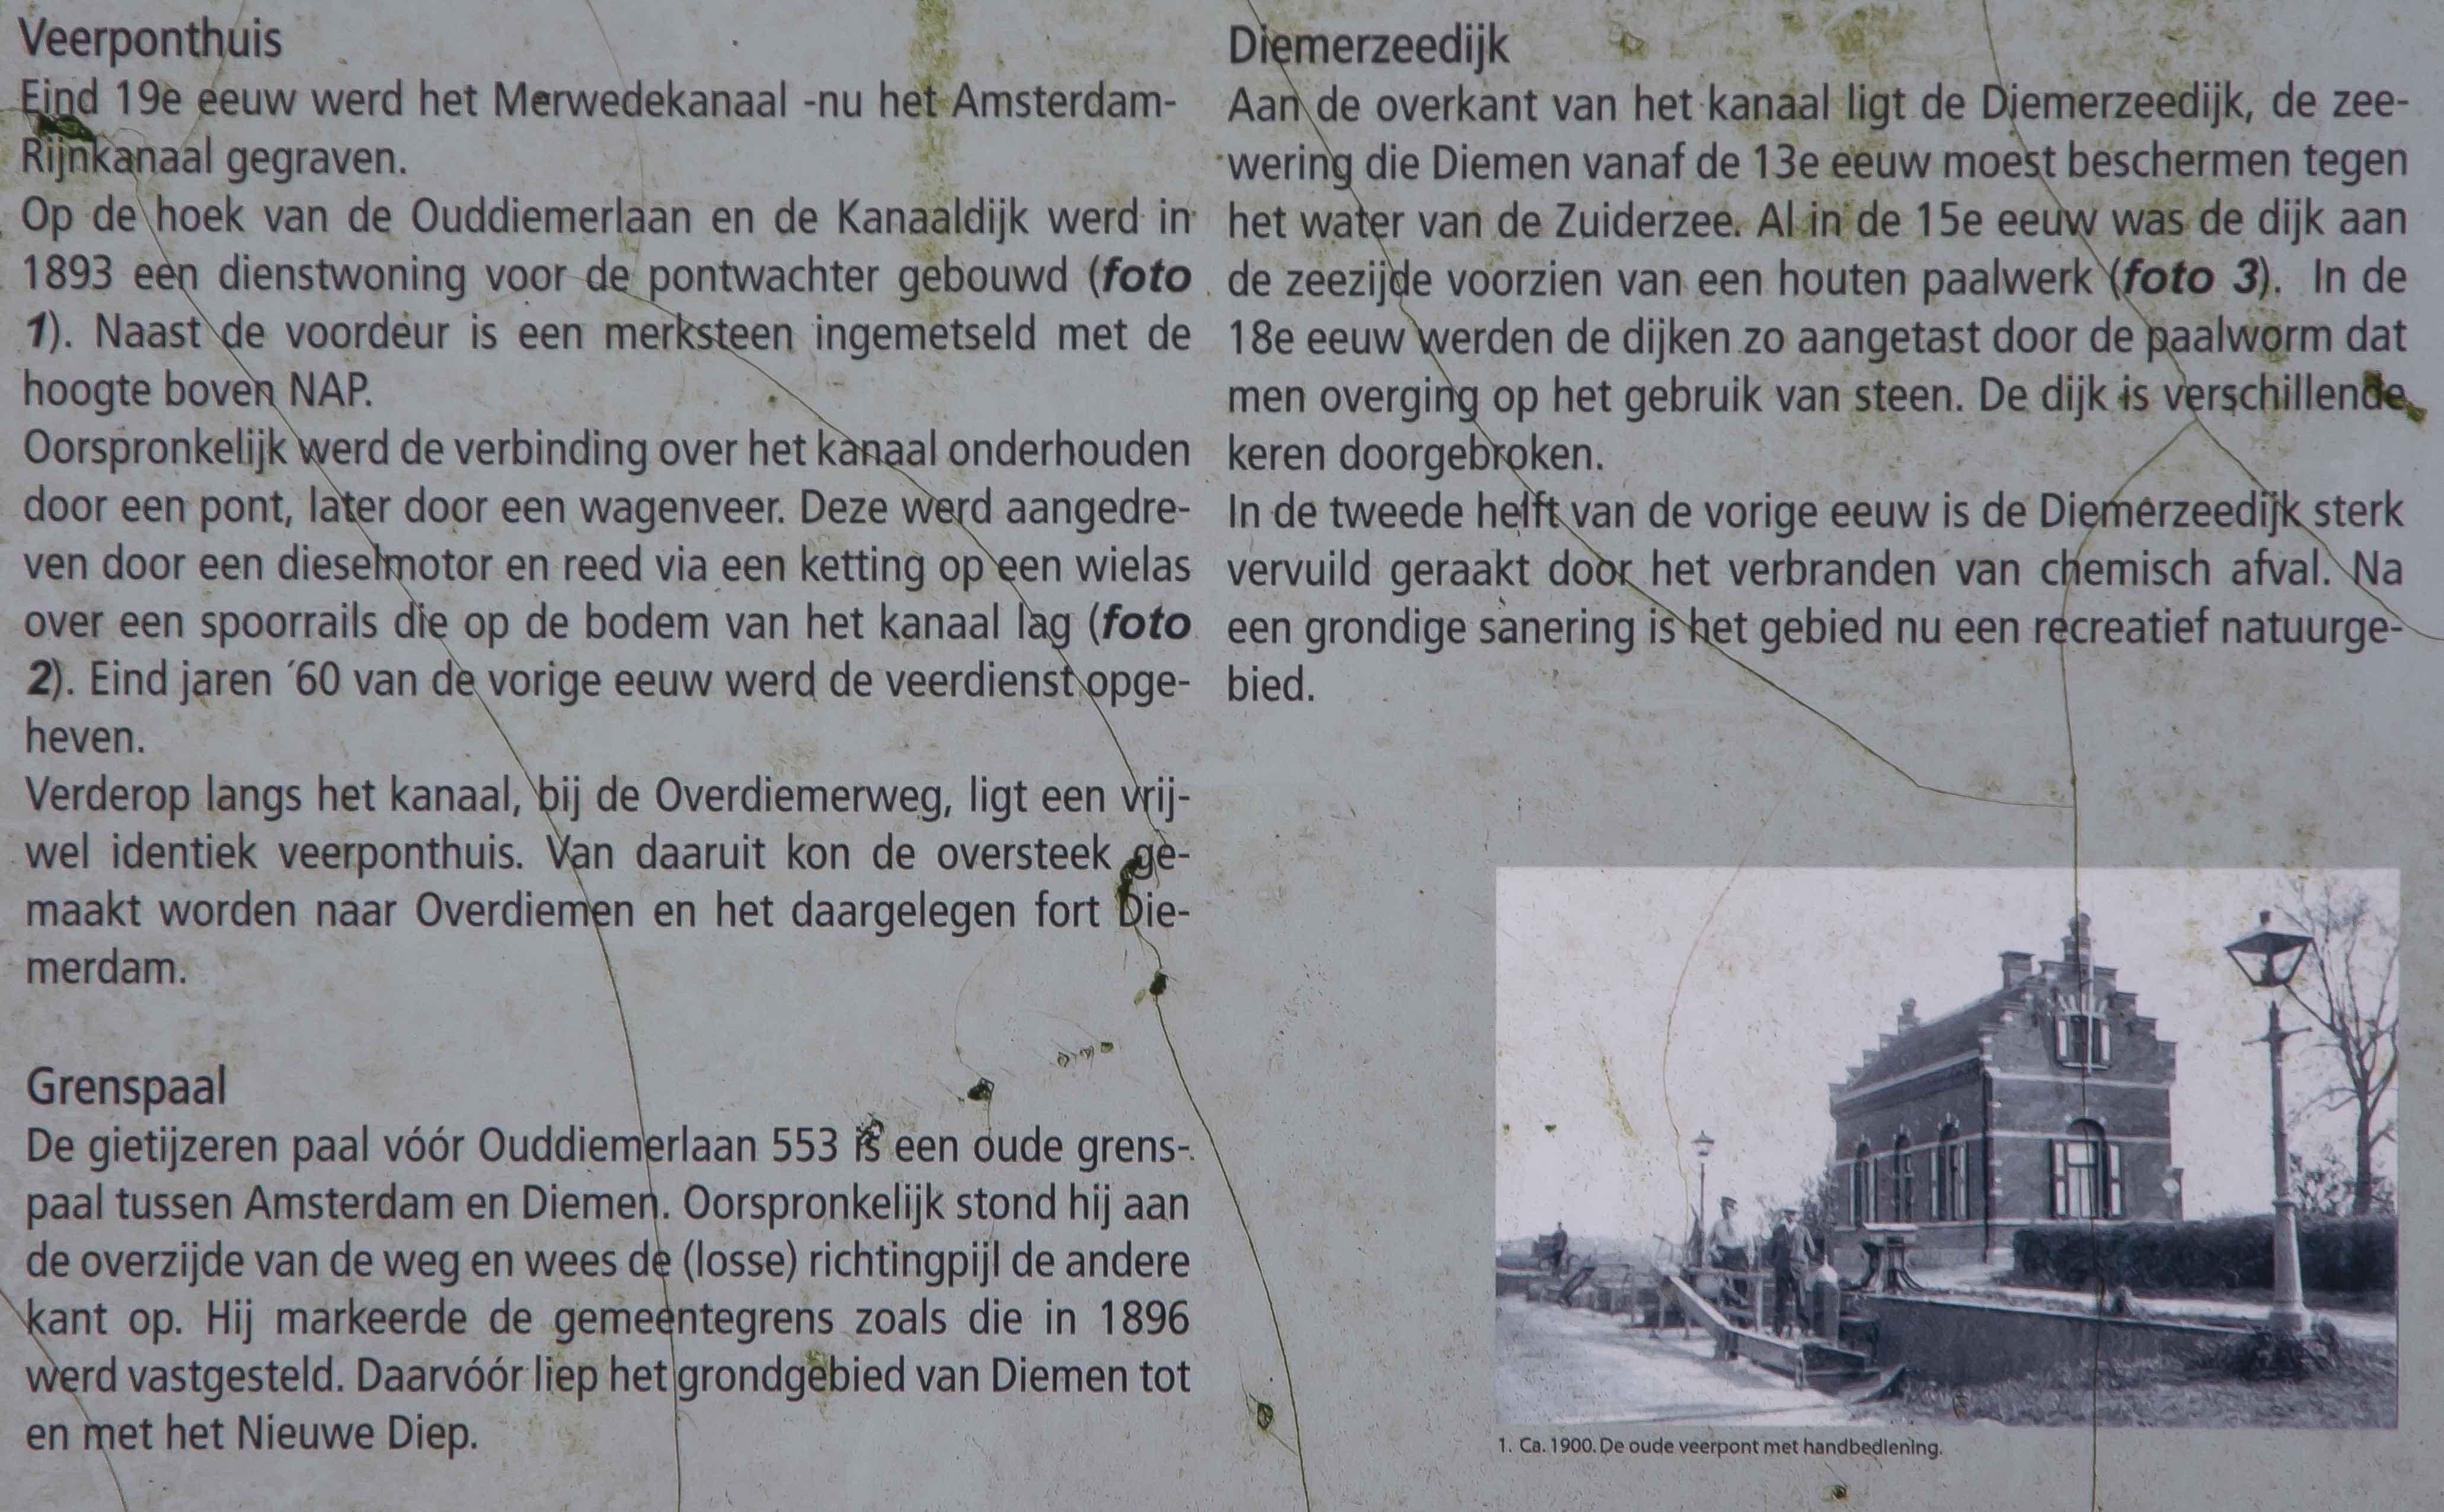 11. Detail info